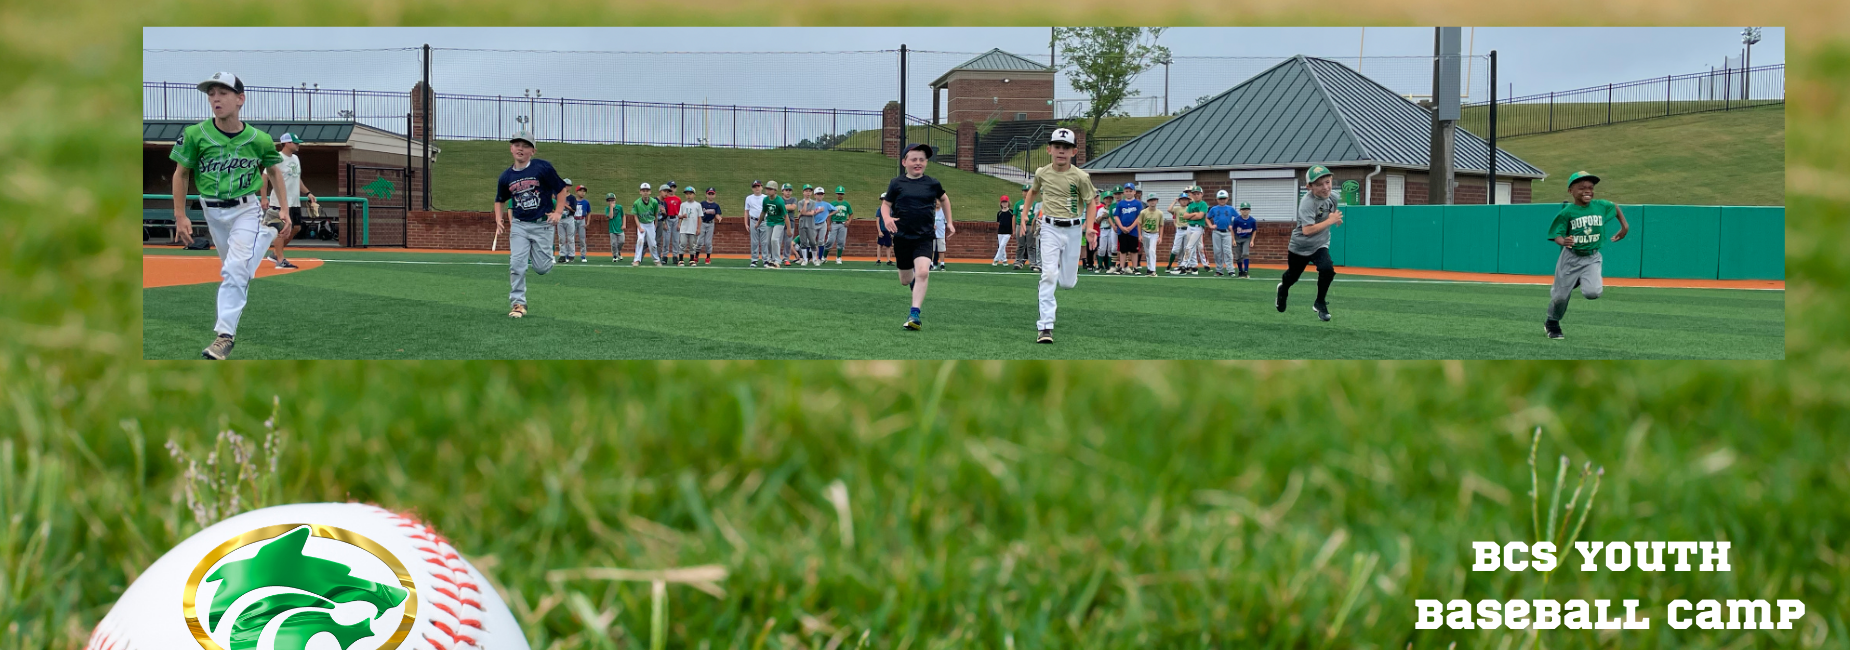 bcs baseball camp